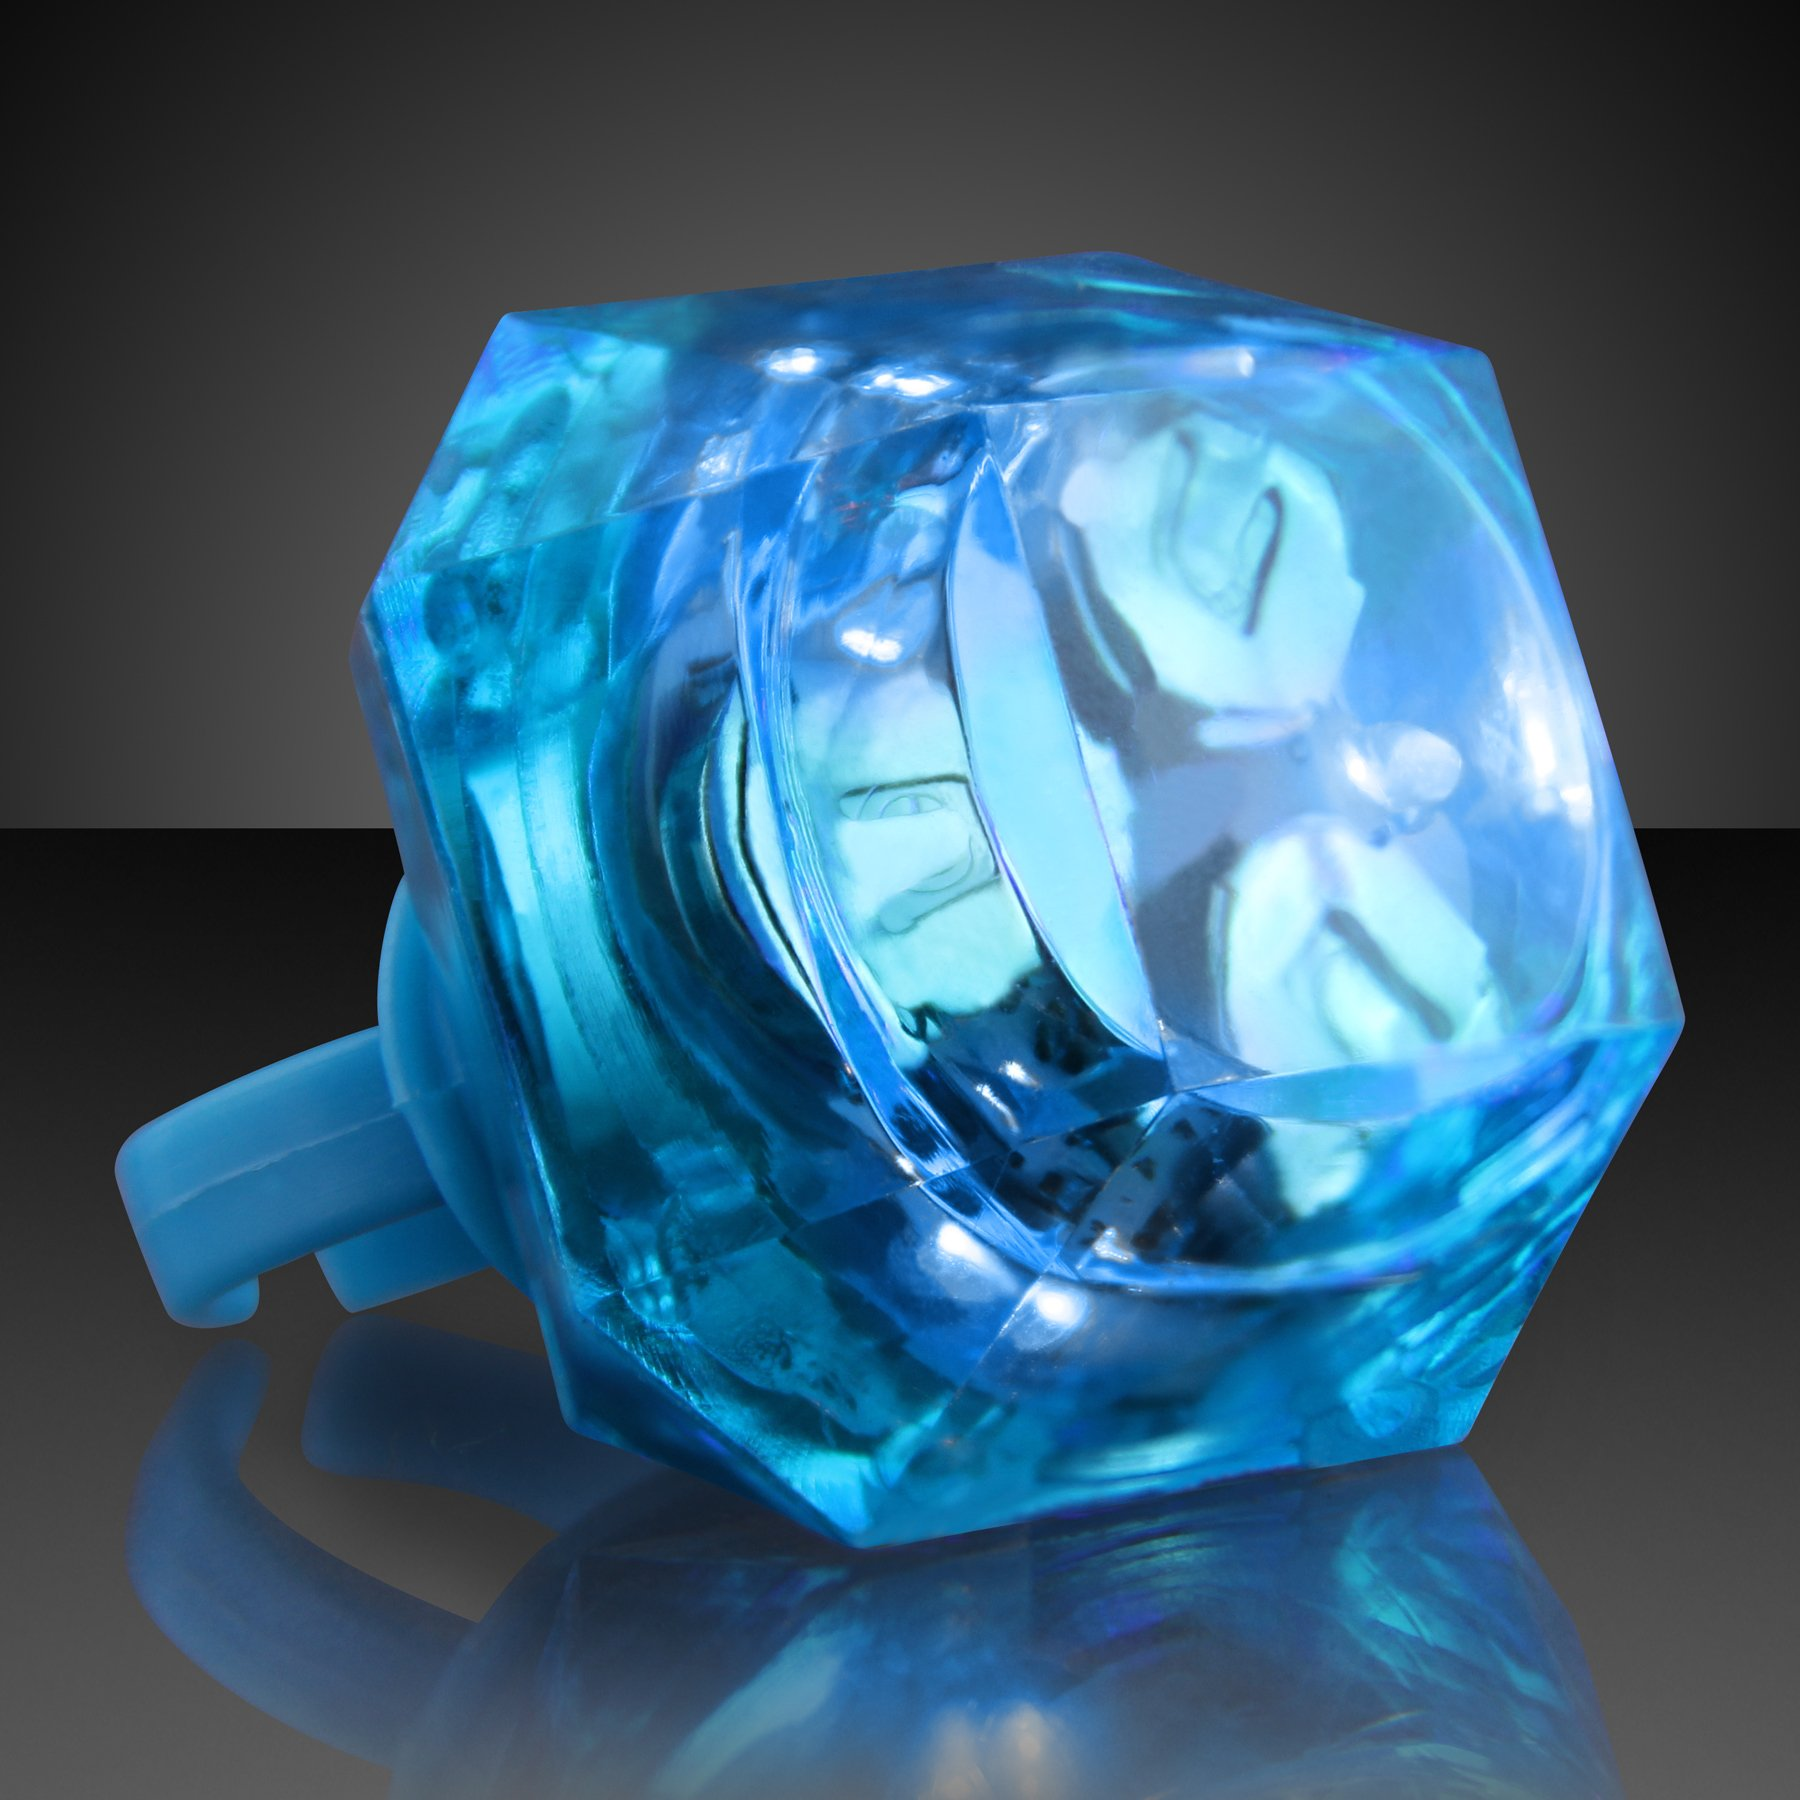 FlashingBlinkyLights Blue Huge Gem Light Up LED Rings (Set of 24)